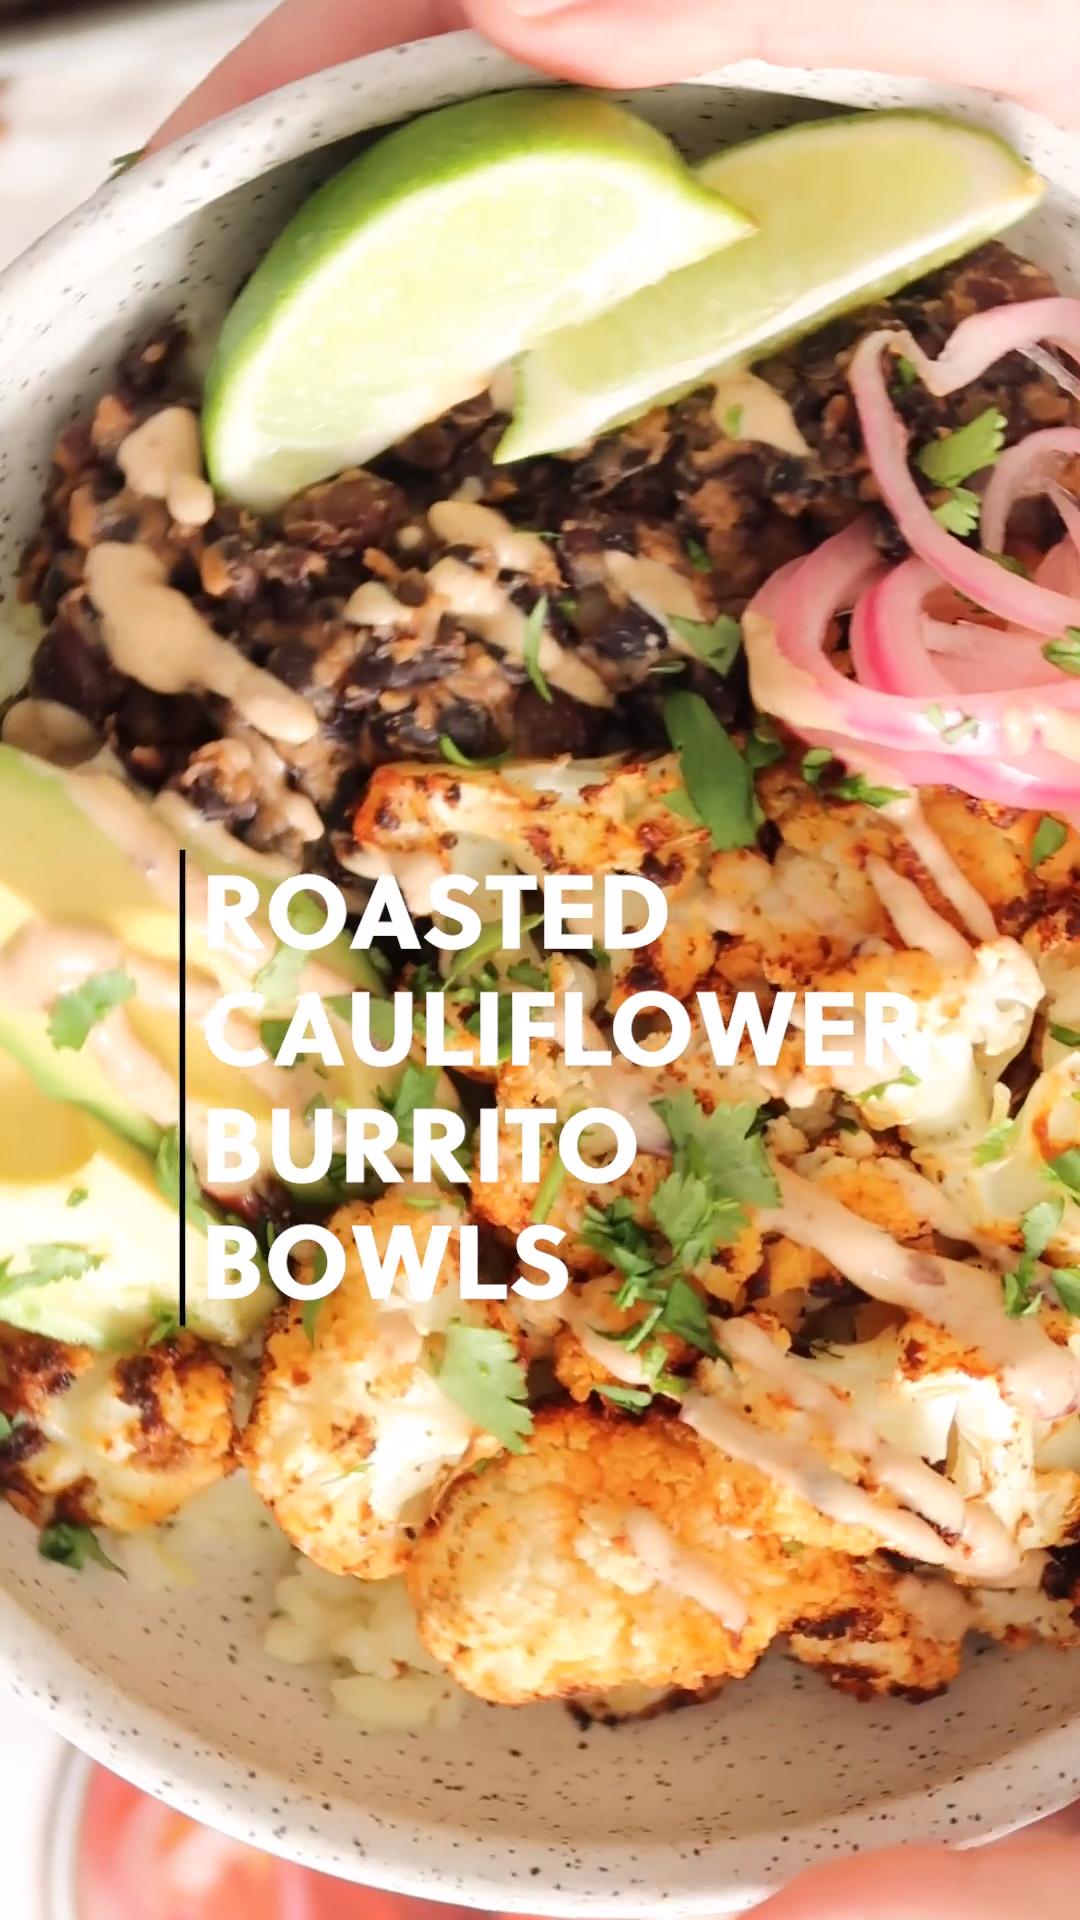 Roasted Cauliflower Burrito Bowls